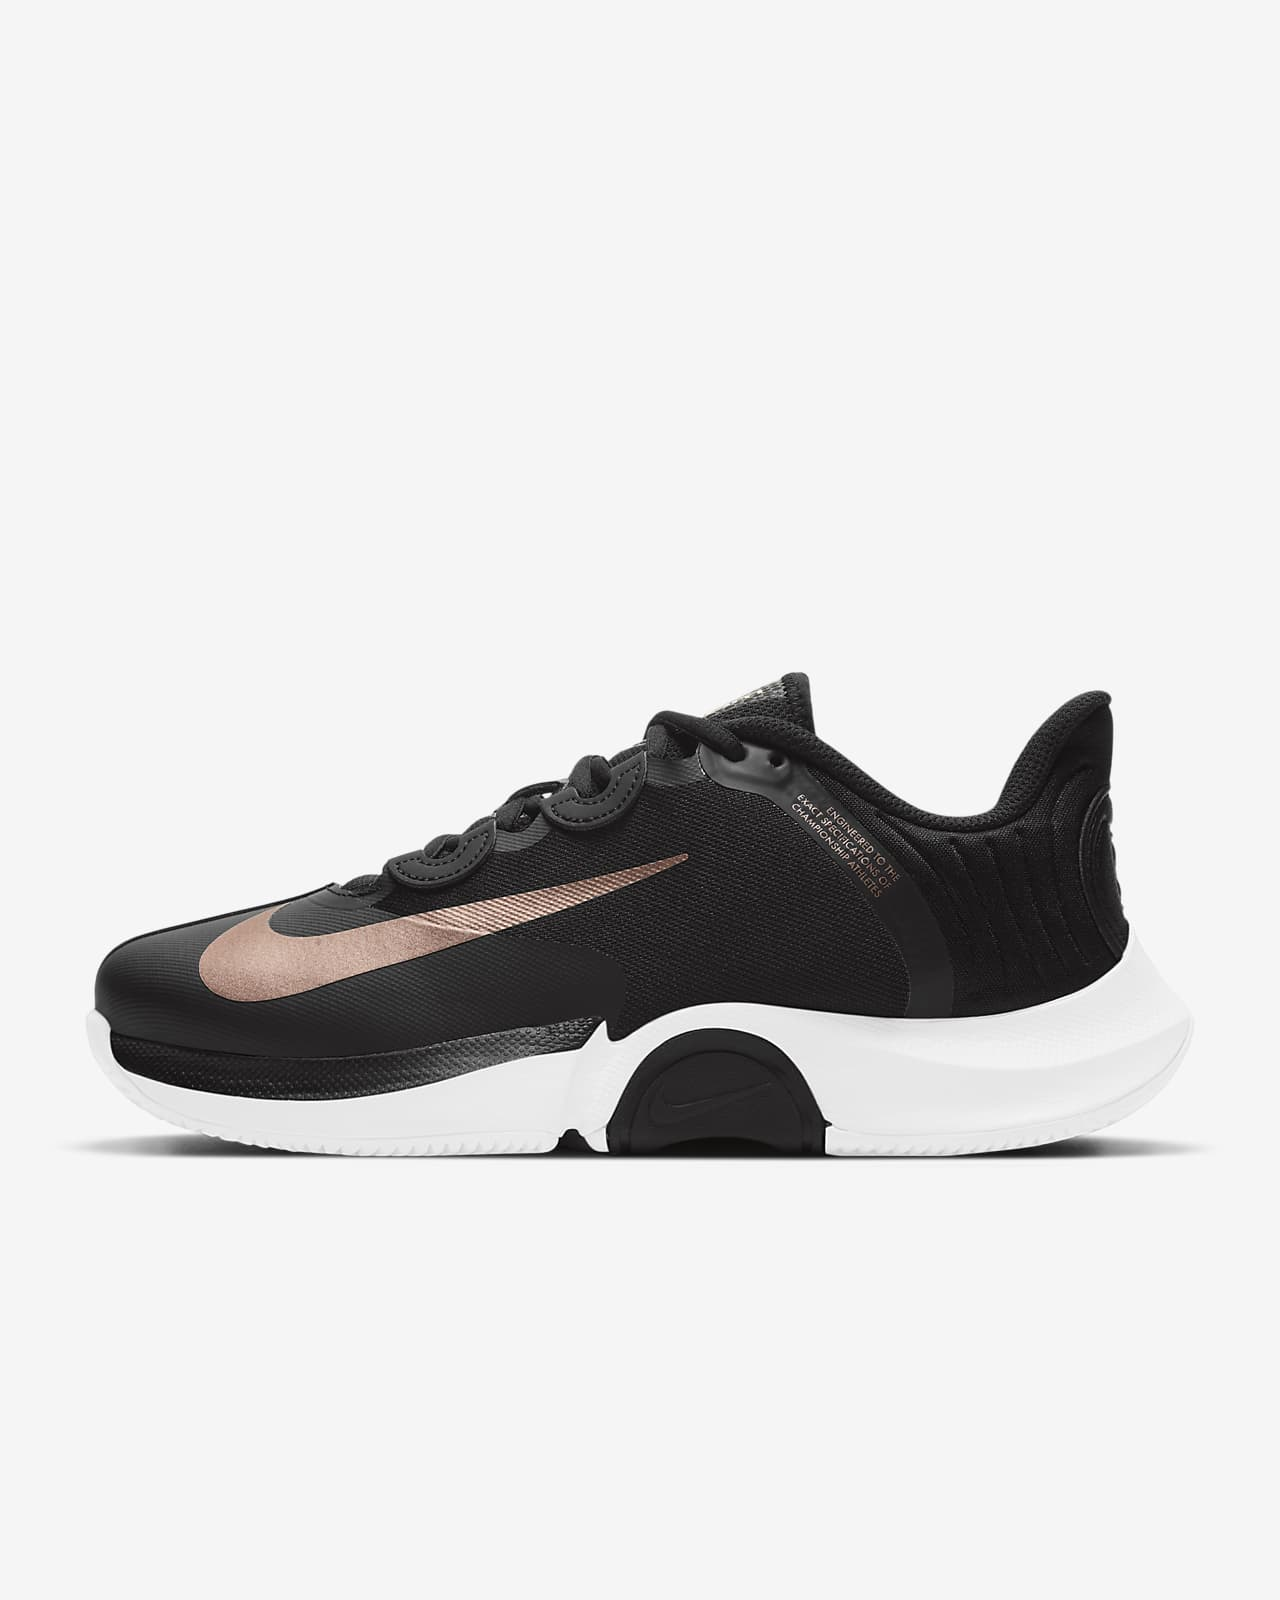 Sapatilhas de ténis para piso duro NikeCourt Air Zoom GP Turbo para mulher